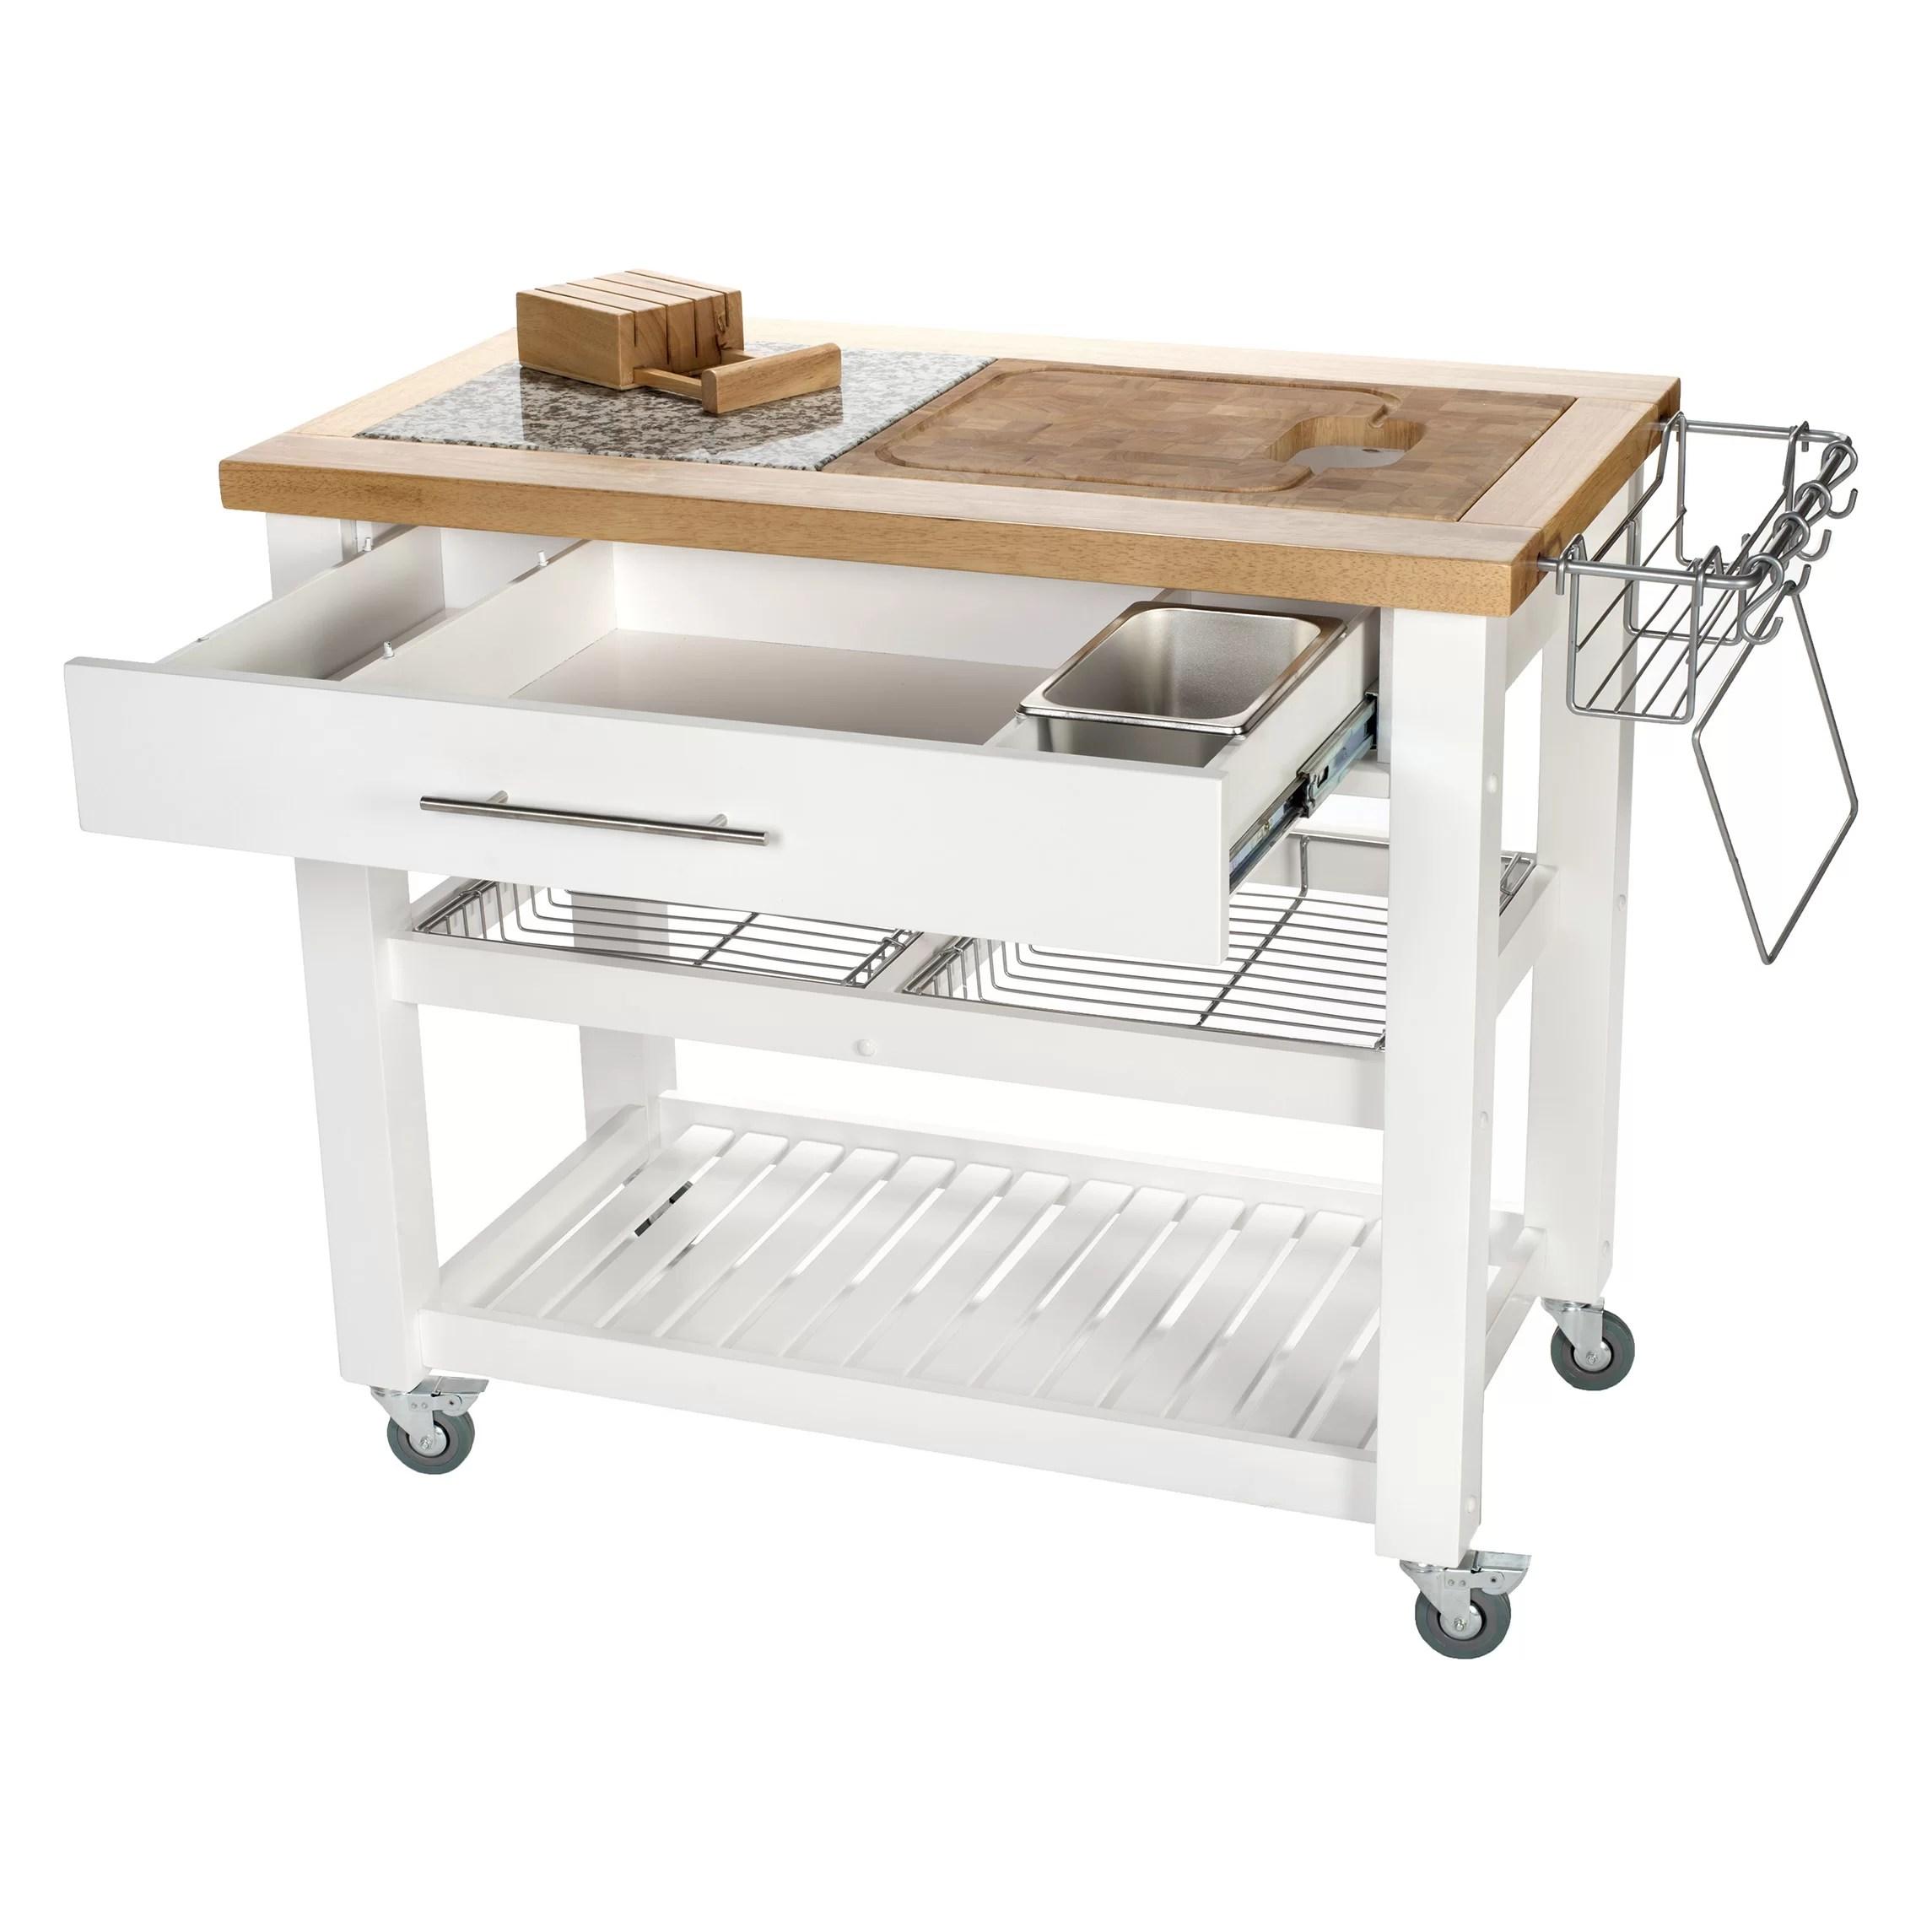 chris and kitchen cart towels target pro chef island reviews wayfair